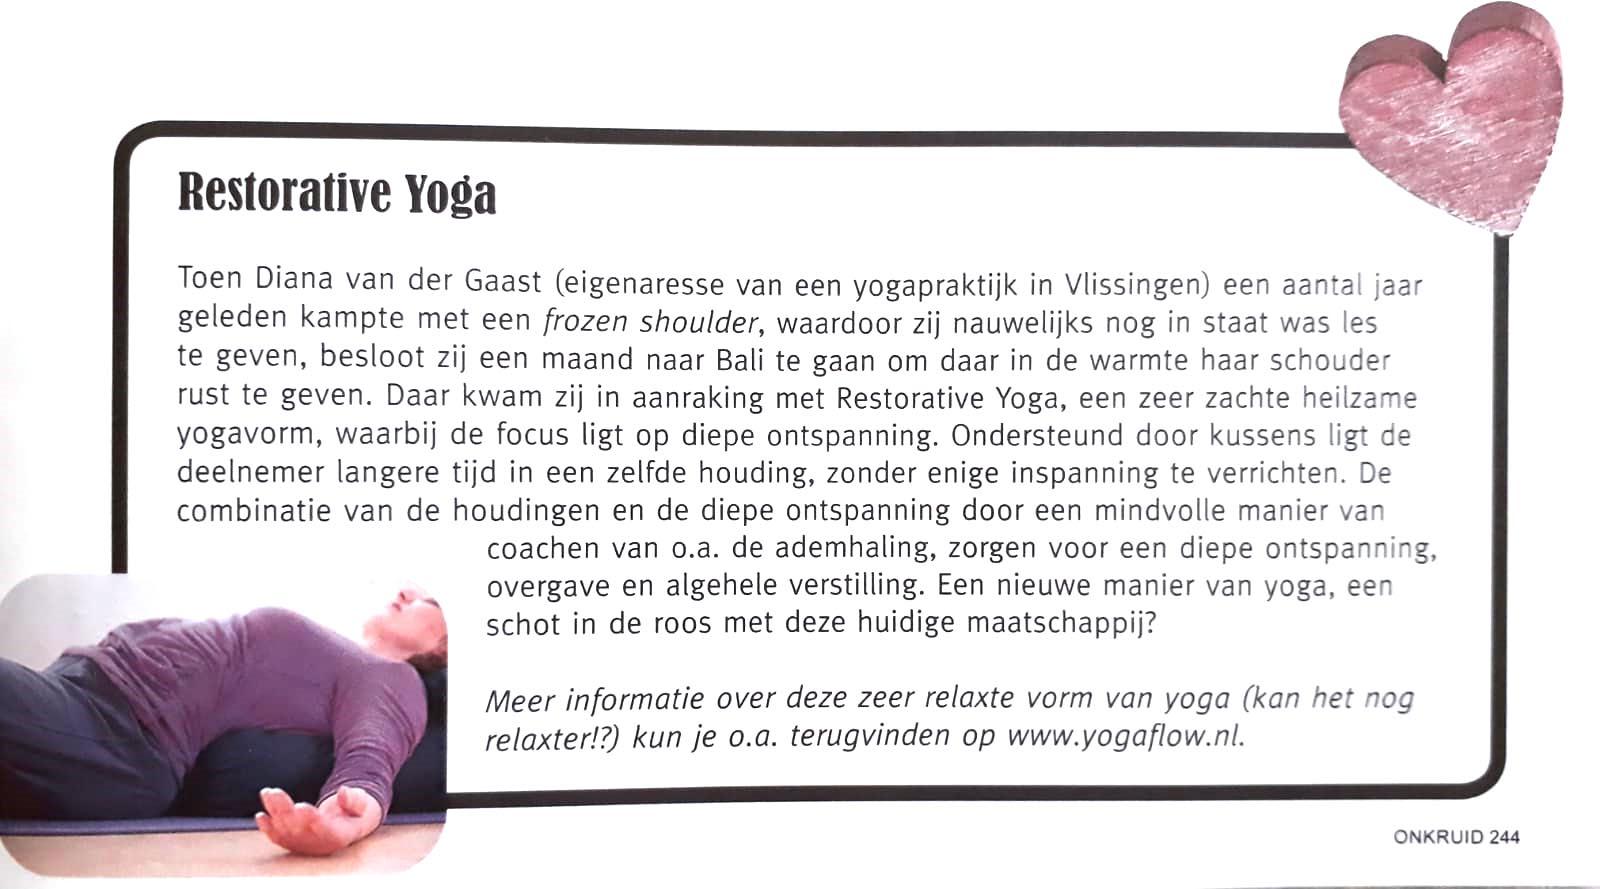 yogaflow restorative yoga